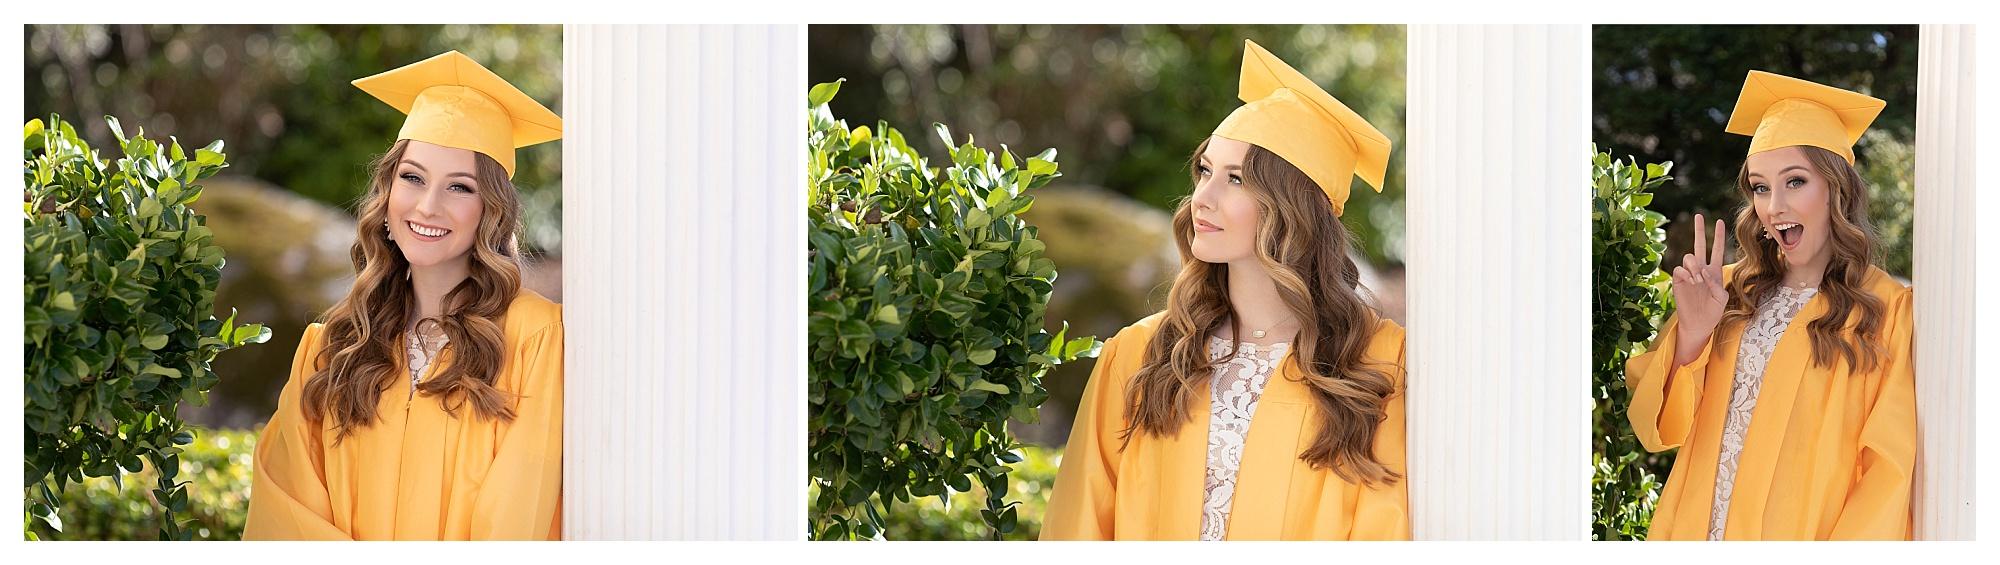 Moorpark High School Senior Portrait Photographer_4863.jpg